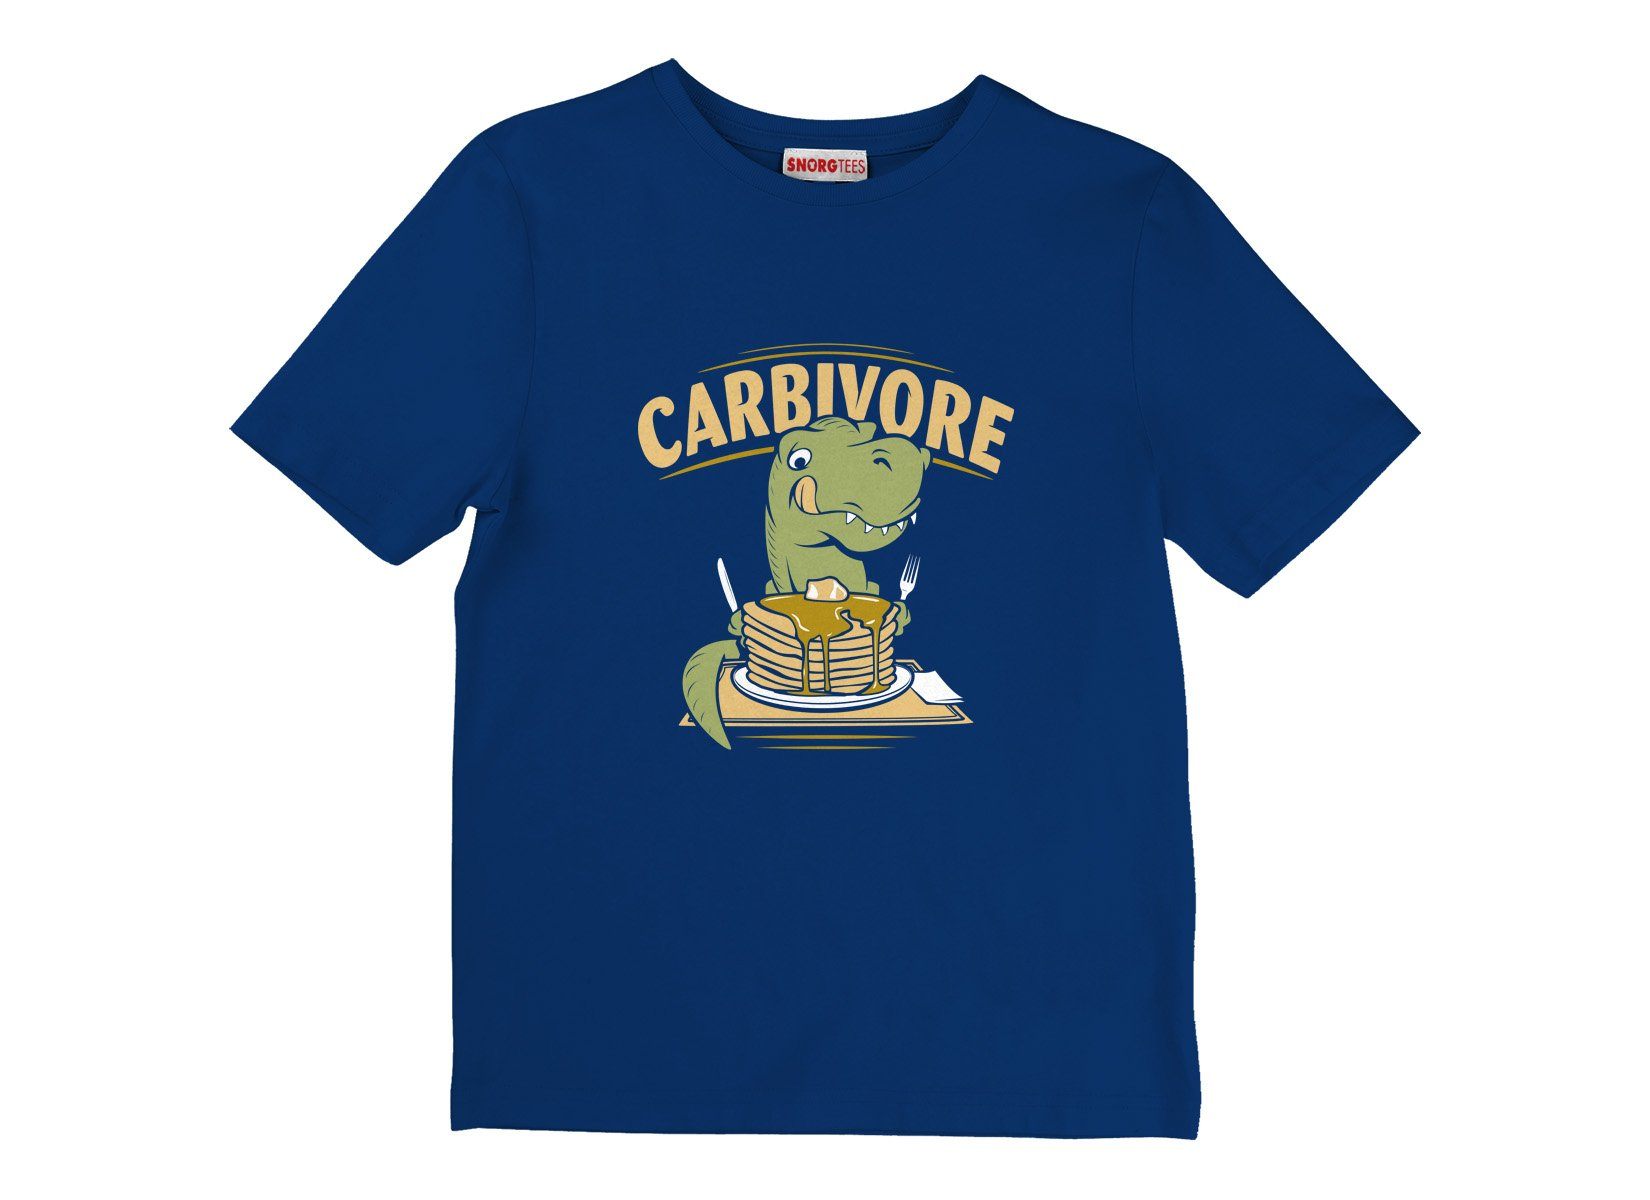 Carbivore on Kids T-Shirt